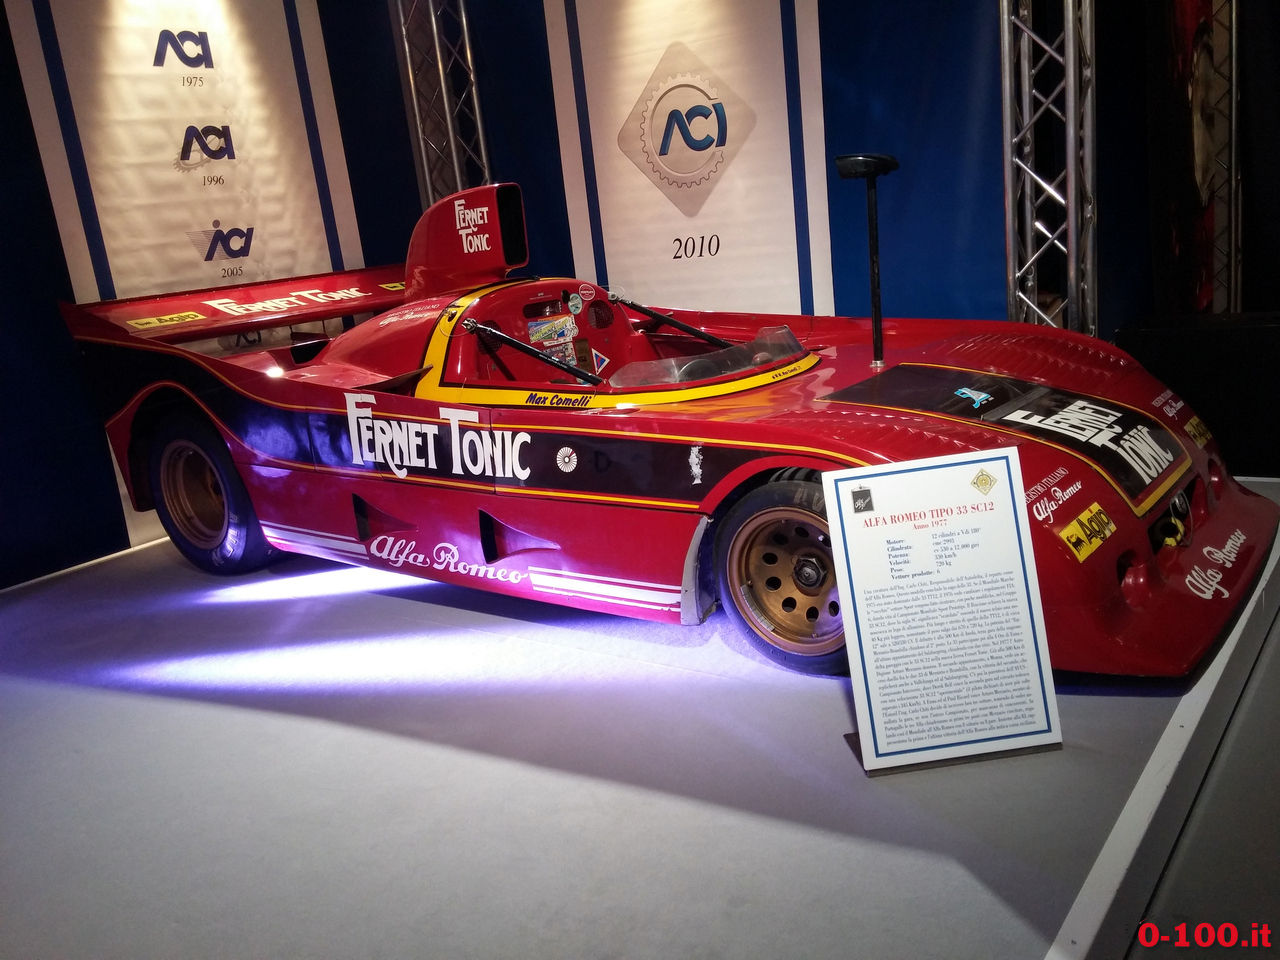 automotodepoca-2016-alfa-romeo-car-market-mercato-auto-prezzo-price_0-1007